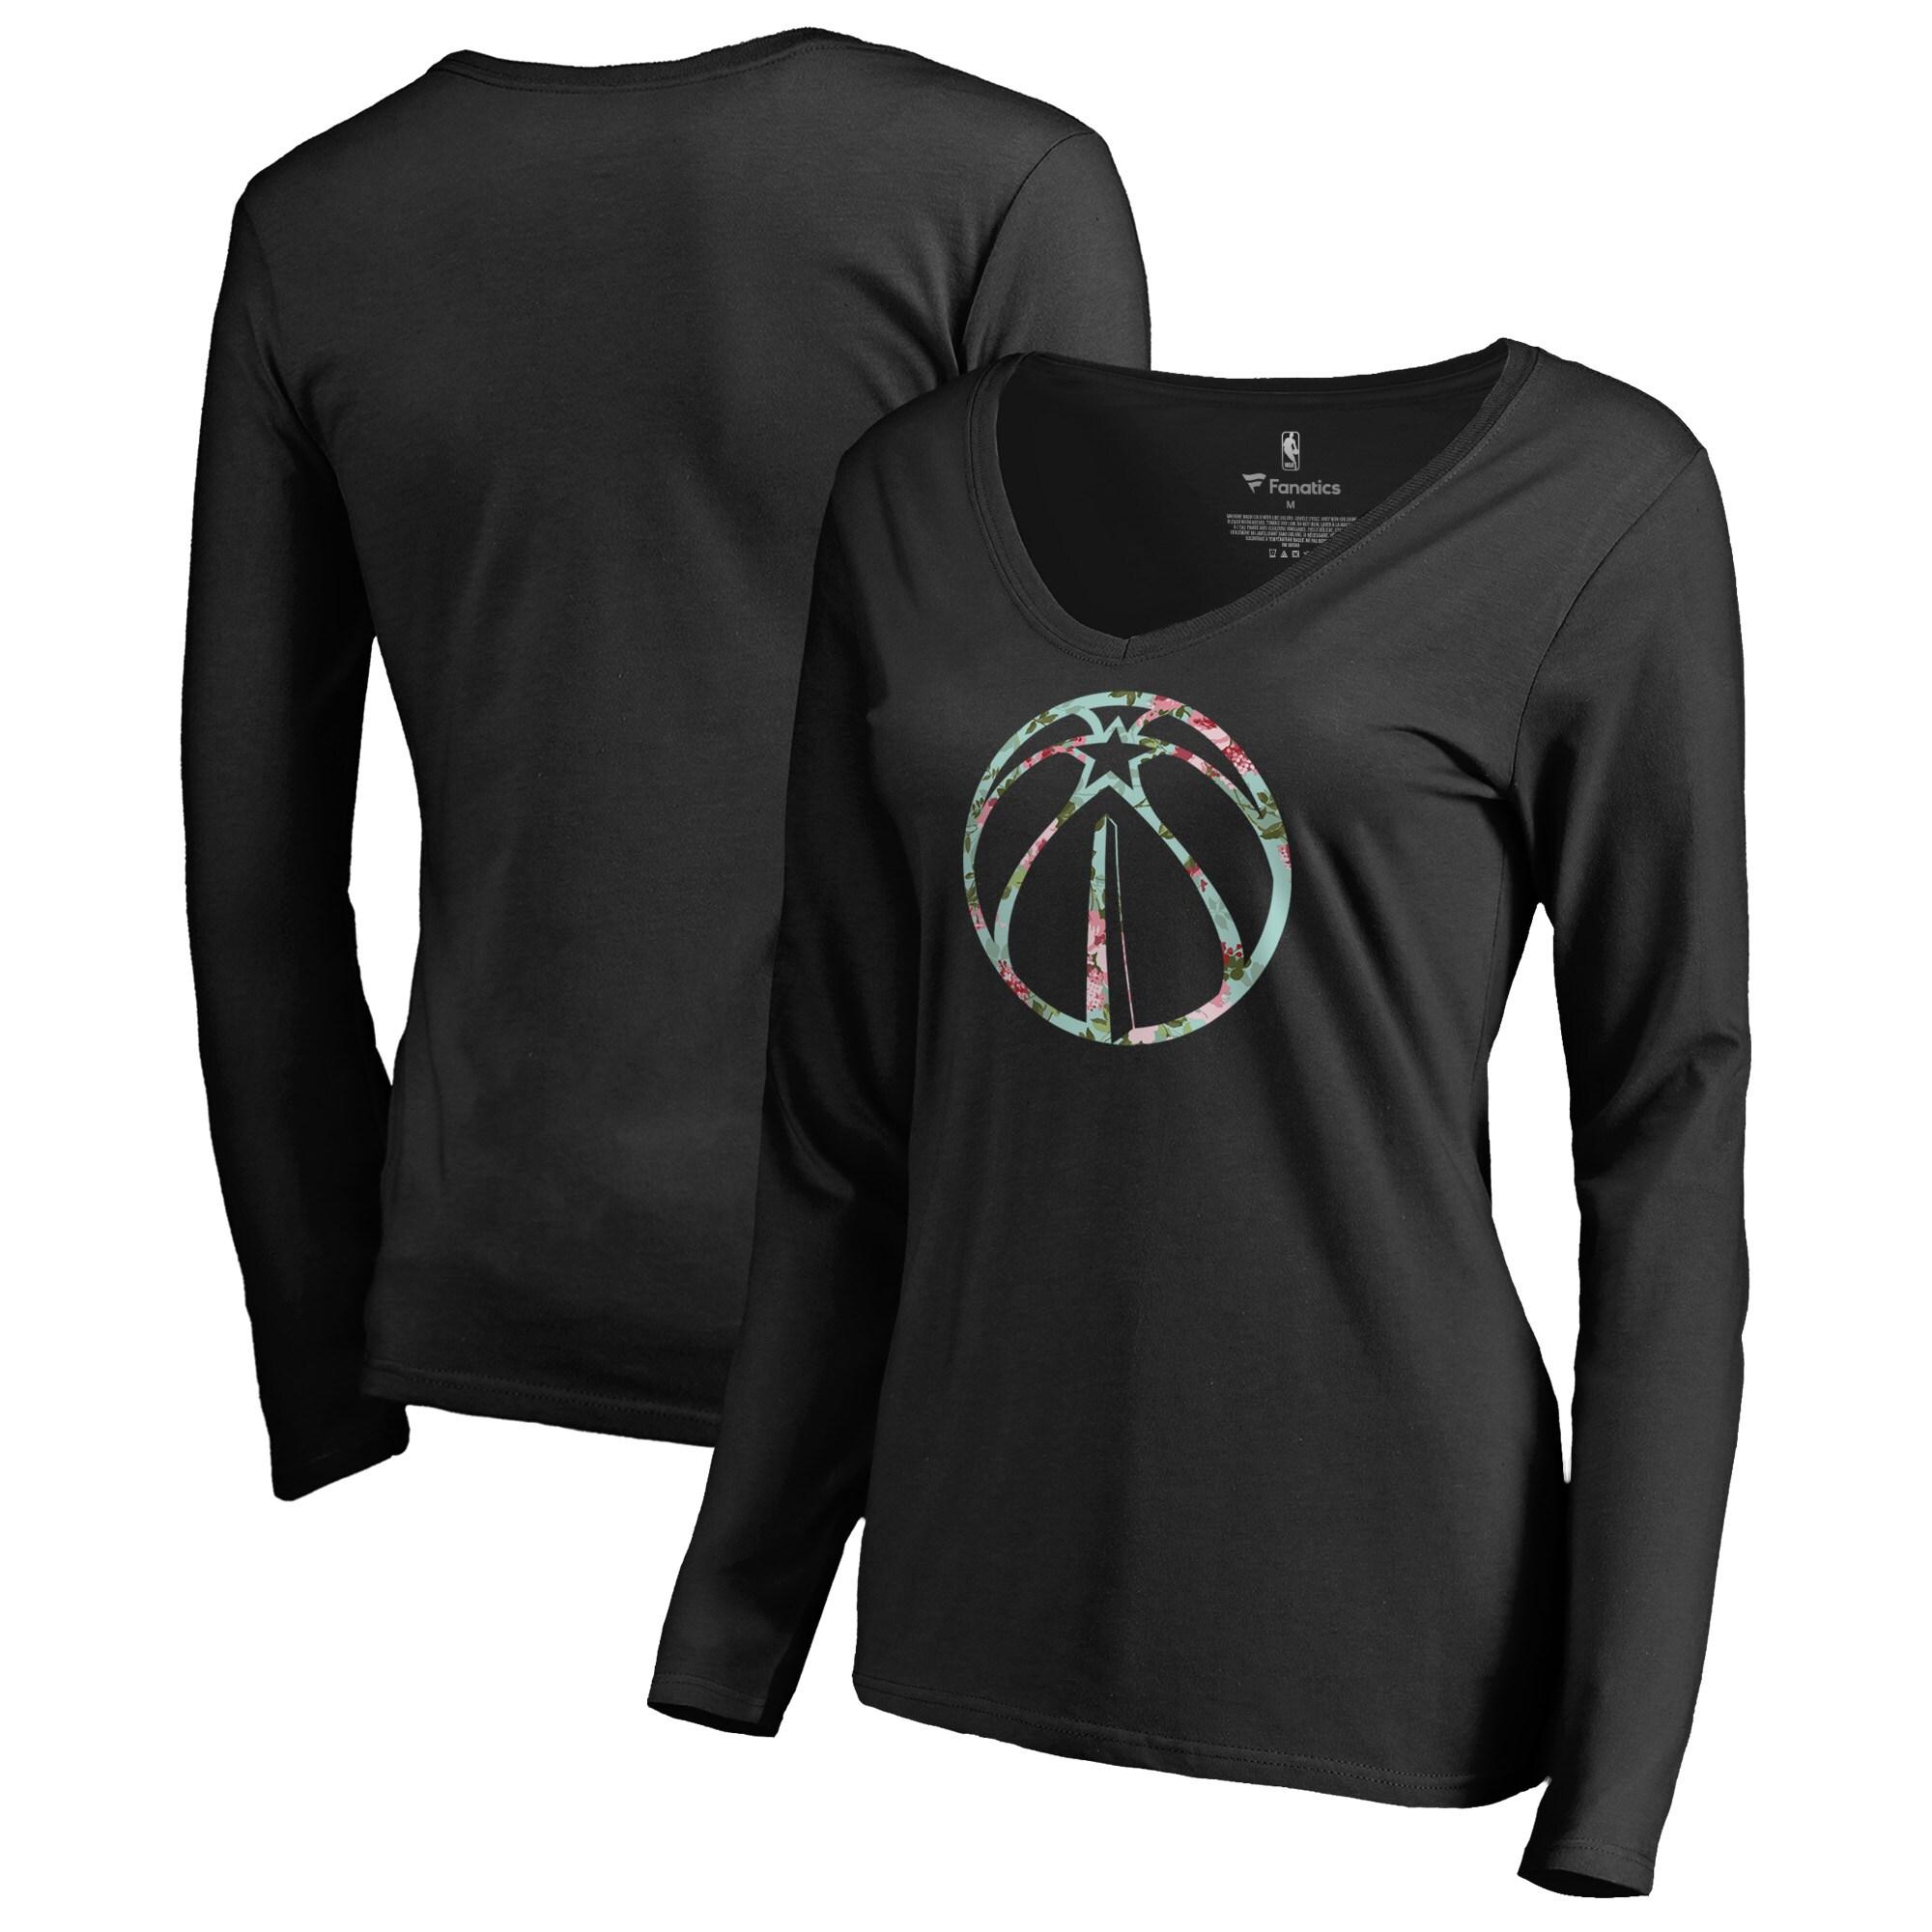 Washington Wizards Fanatics Branded Women's Lovely V-Neck Long Sleeve T-Shirt - Black